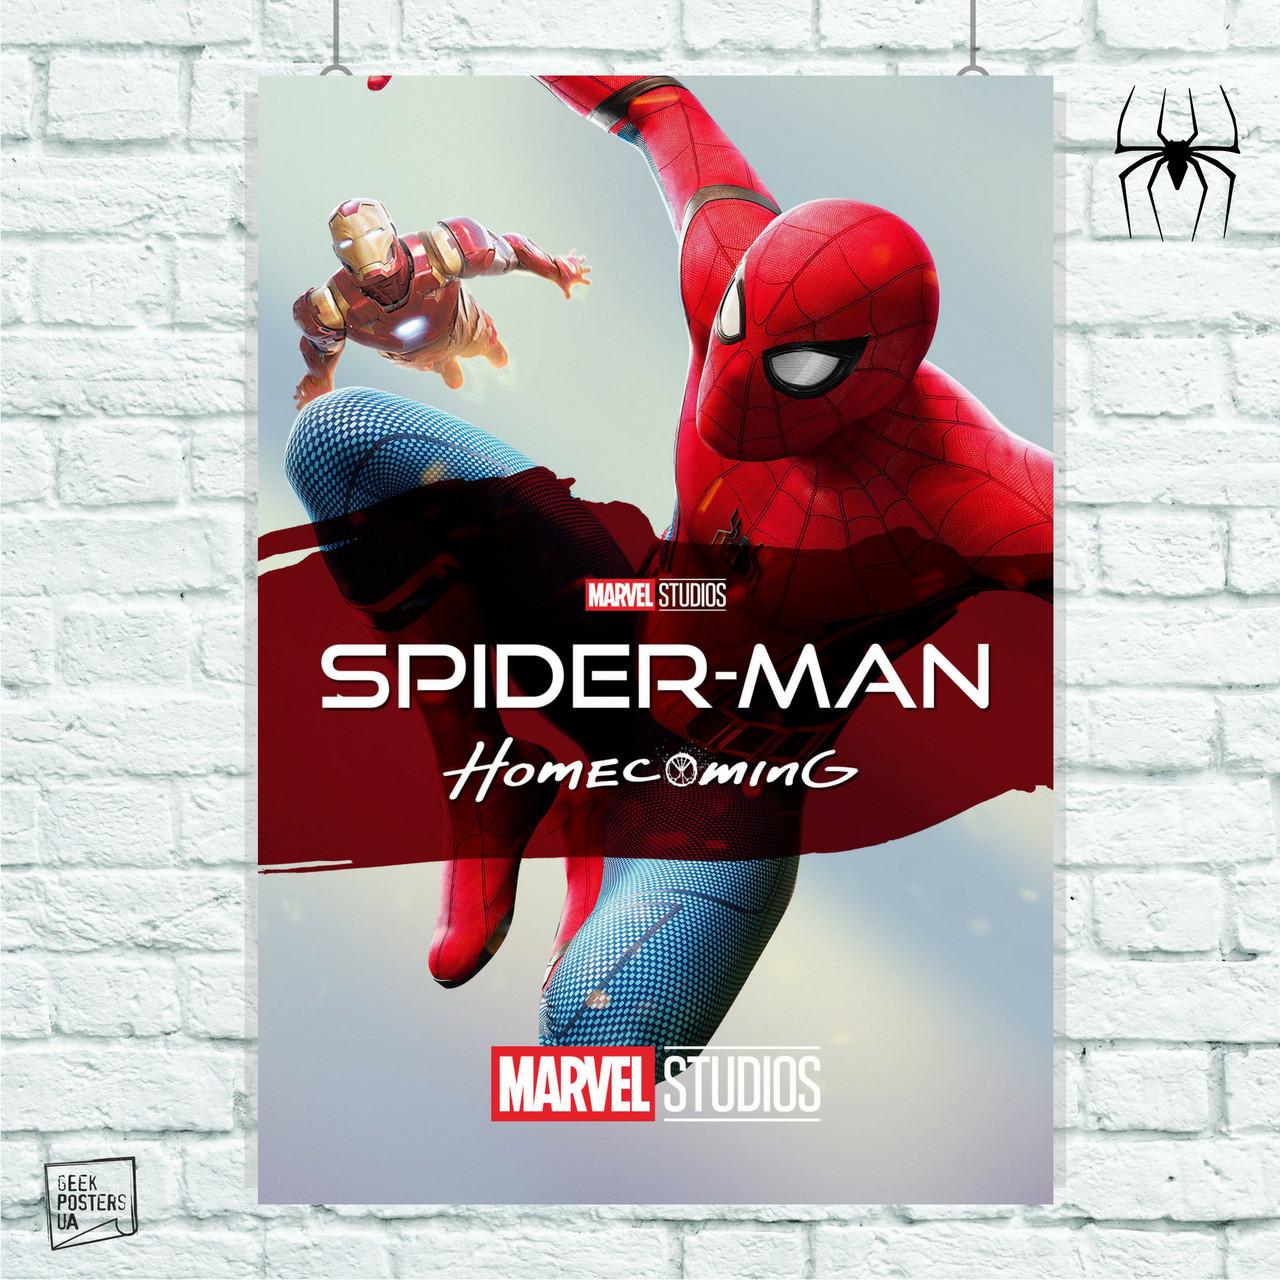 Постер Spider-Man Homecoming, Человек-паук, Спайдермен. Размер 60x42см (A2). Глянцевая бумага